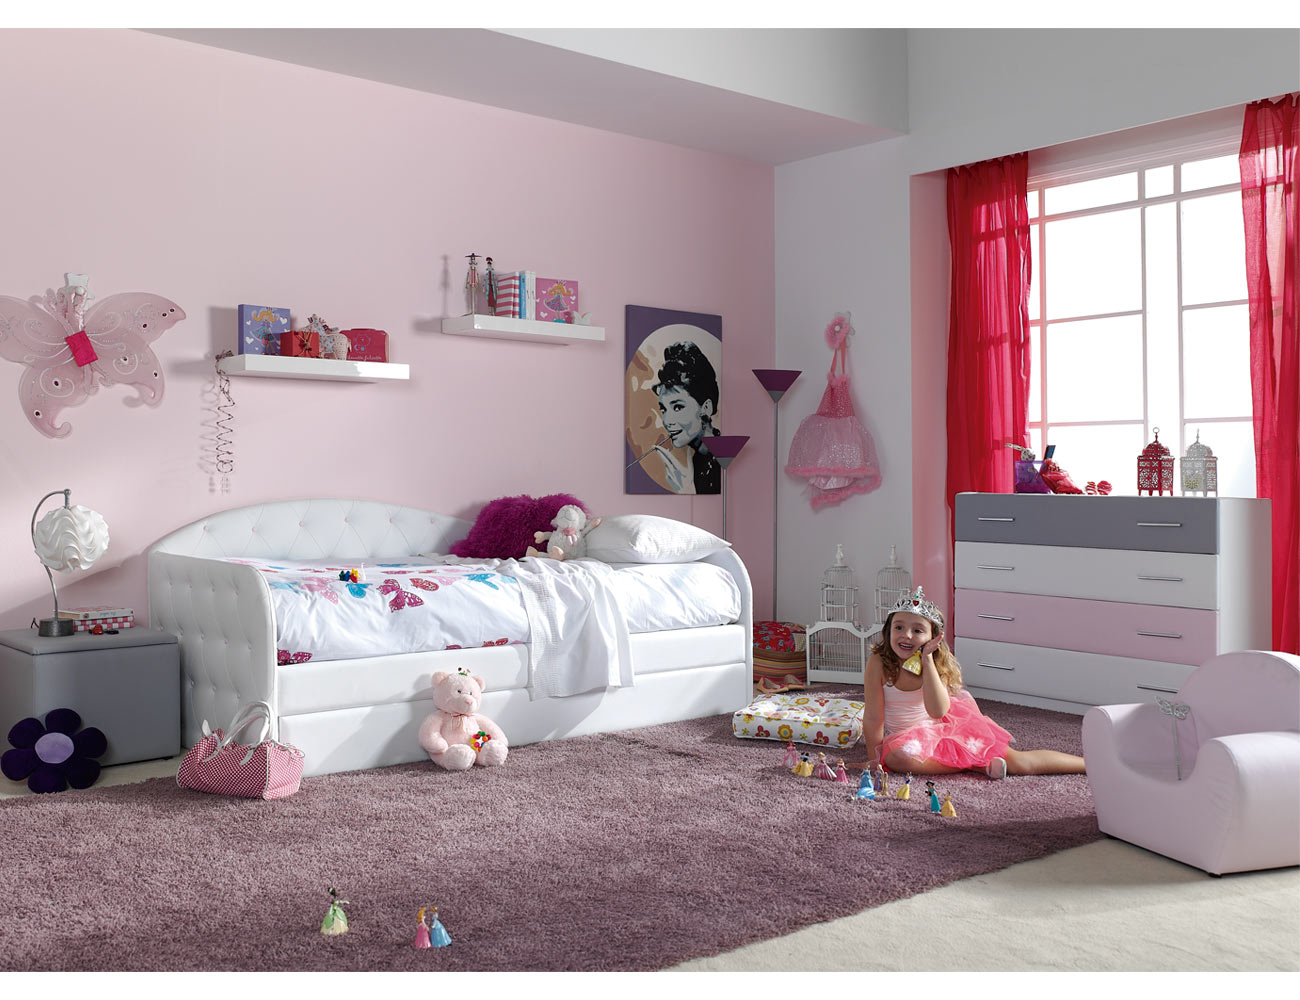 243 cama nido5